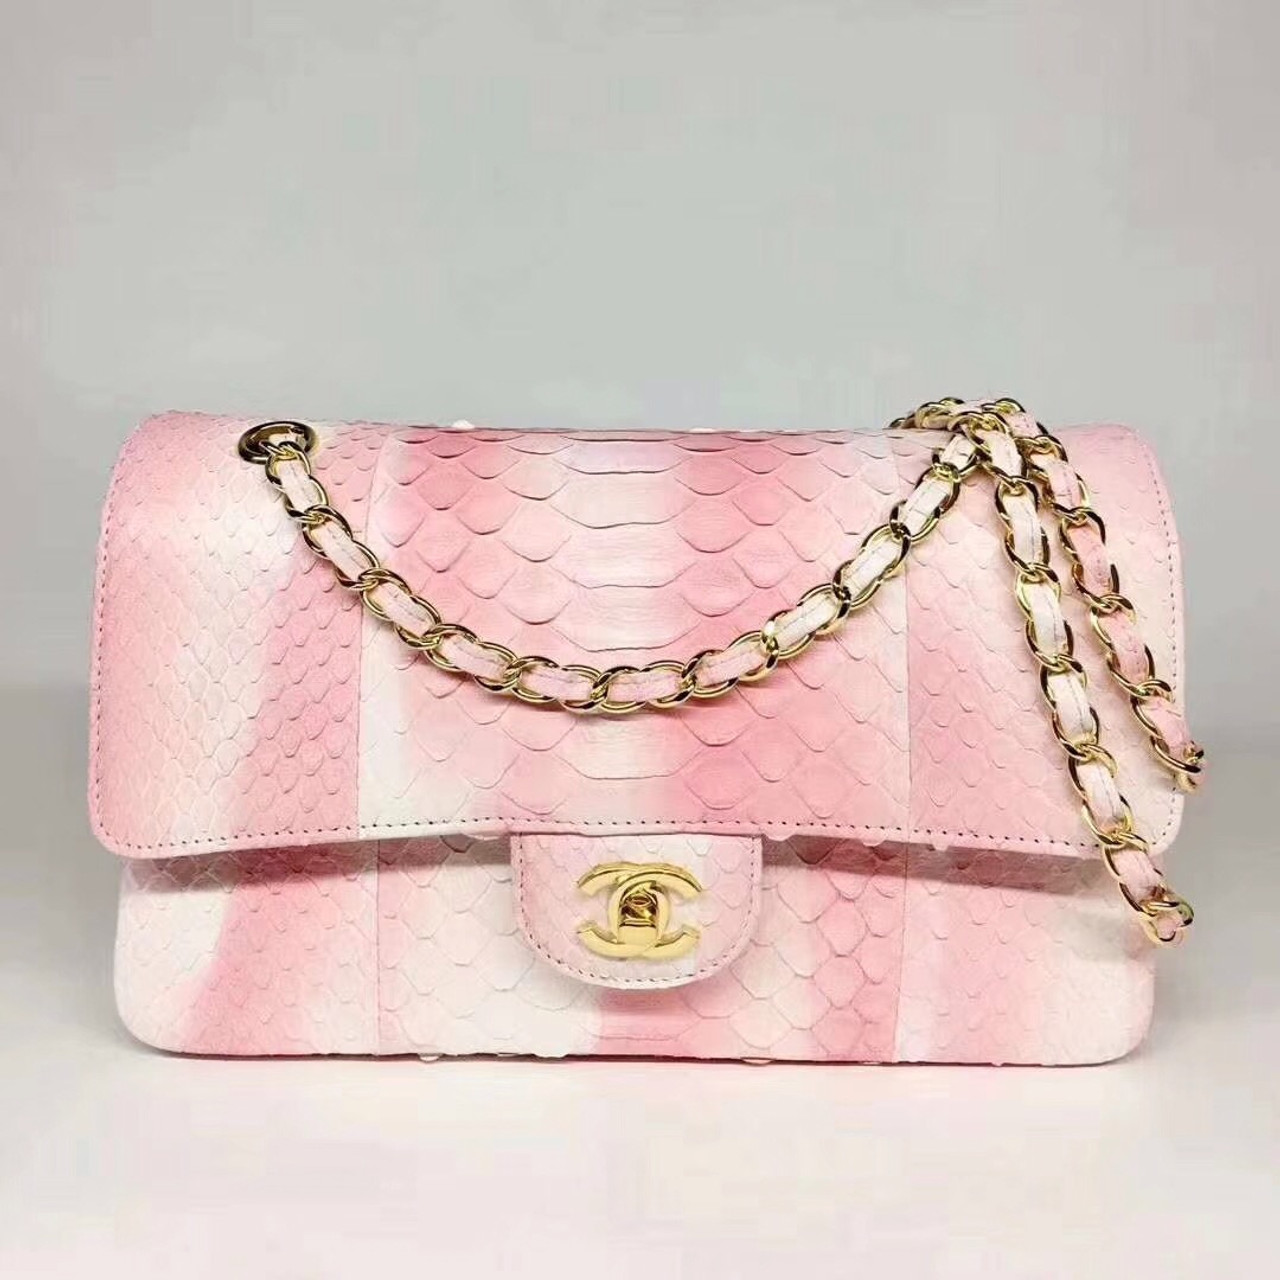 dbecfda953fd Chanel Python Classic Handbag Pink - Bella Vita Moda